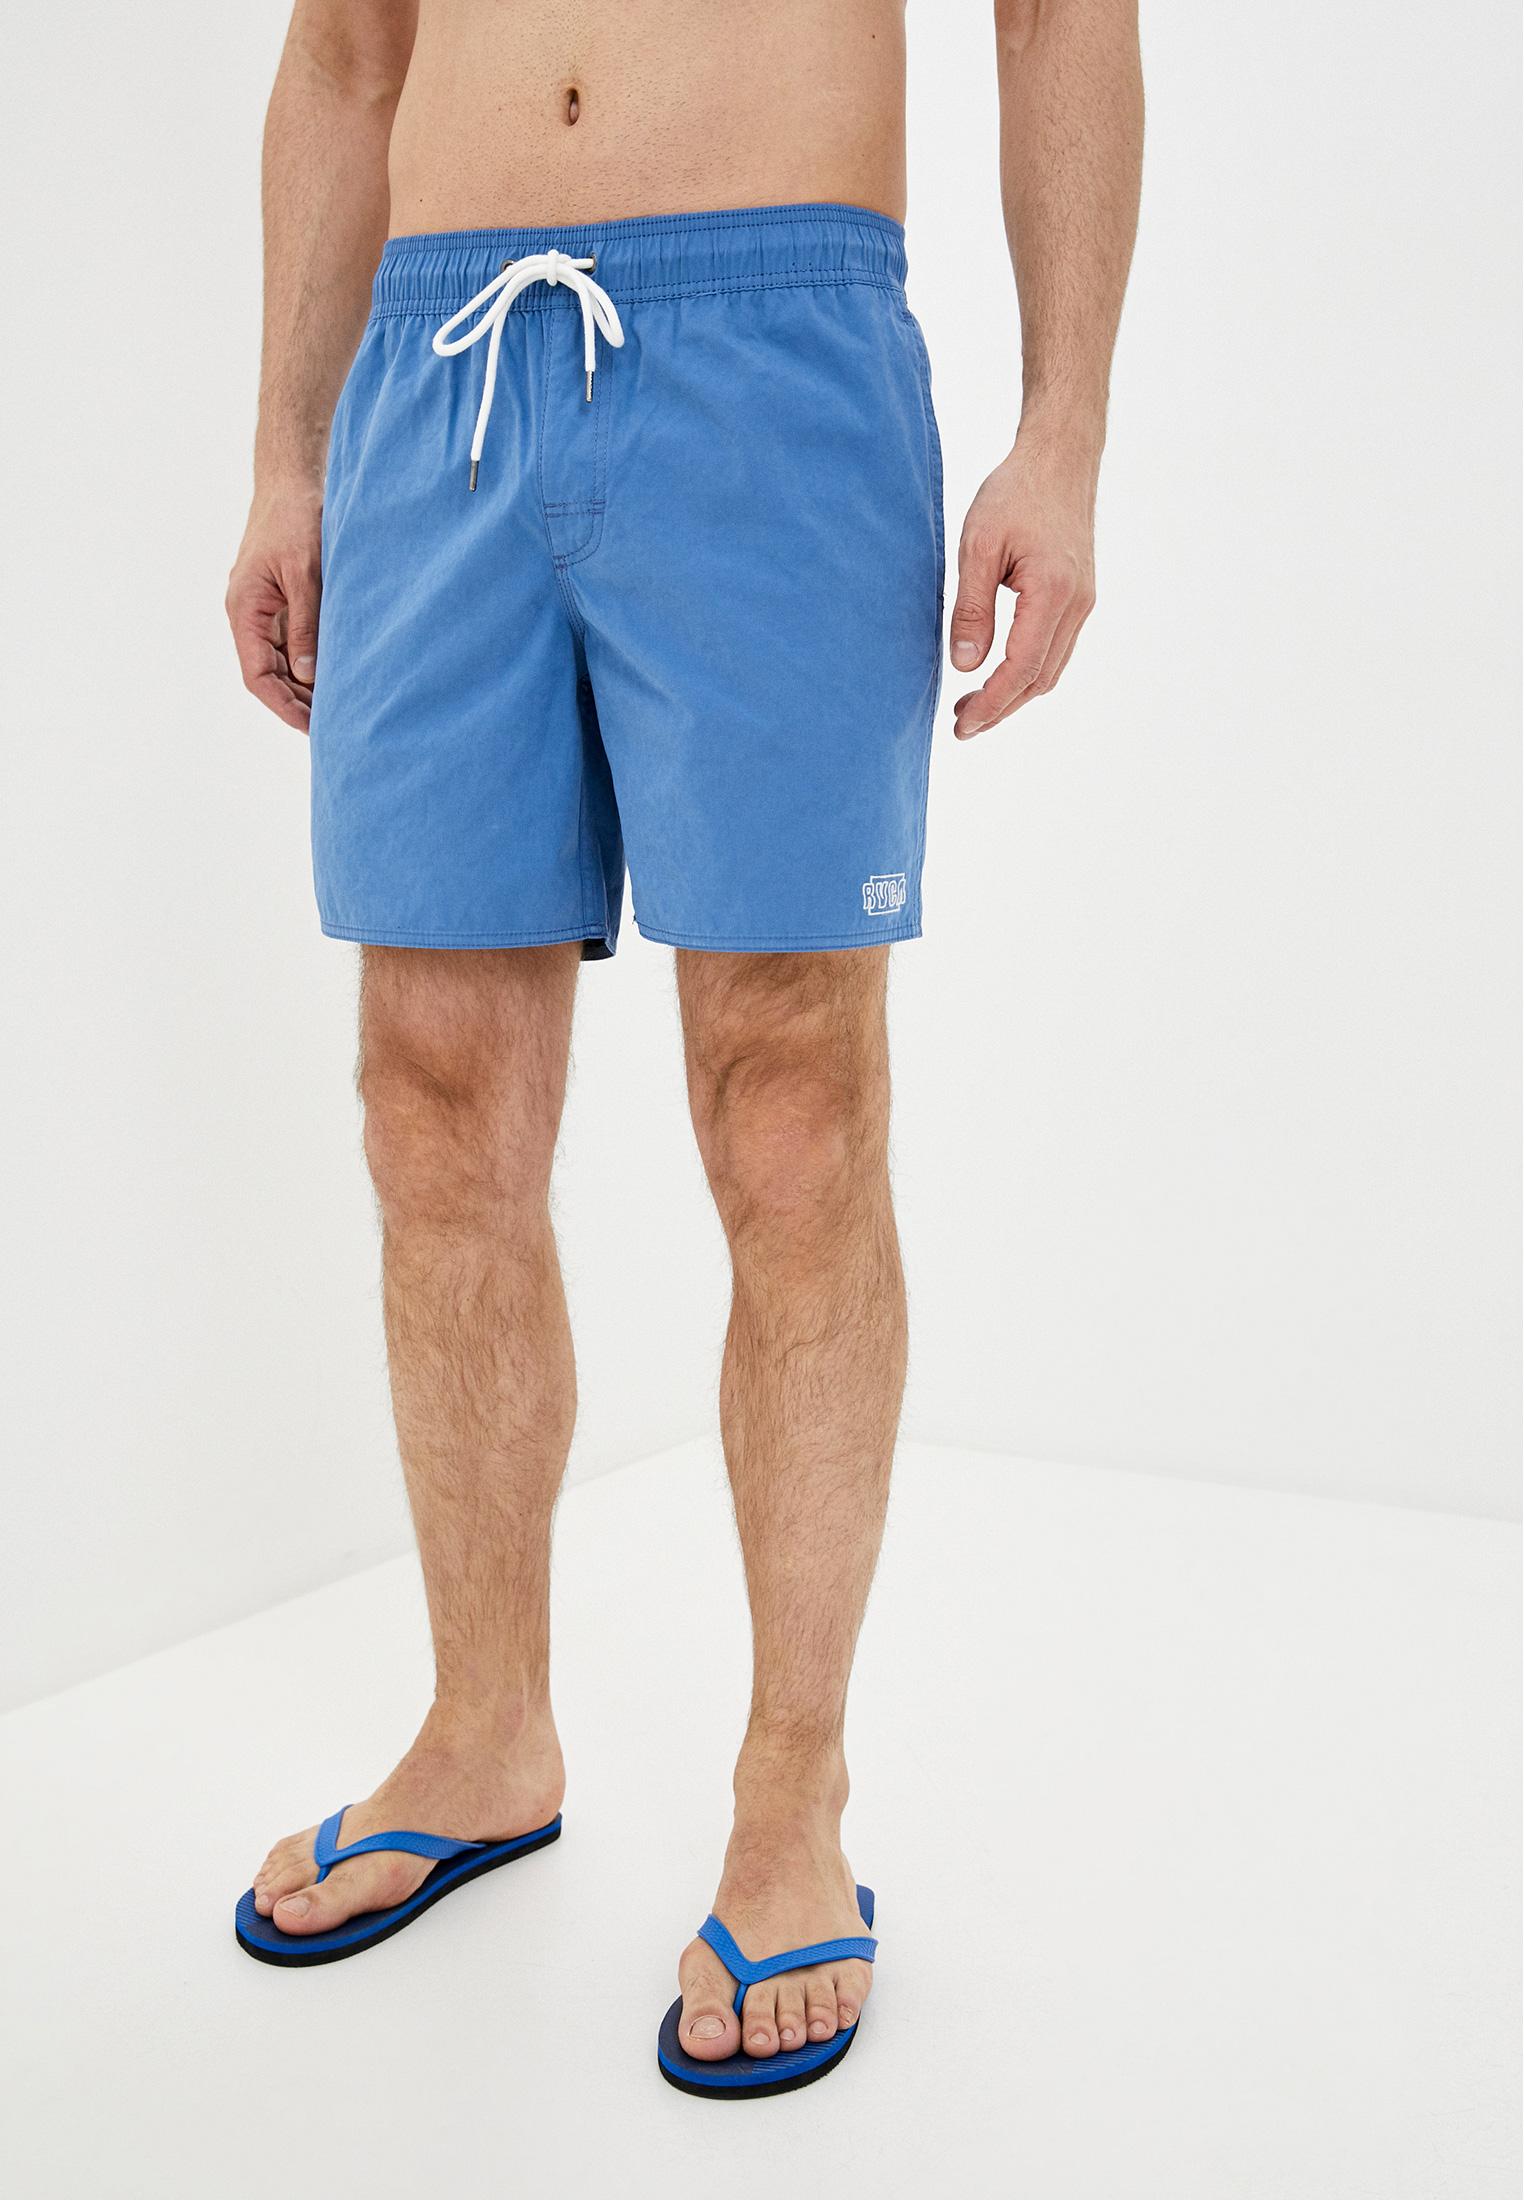 Мужские шорты для плавания RVCA S1VORB-RVP0-3492